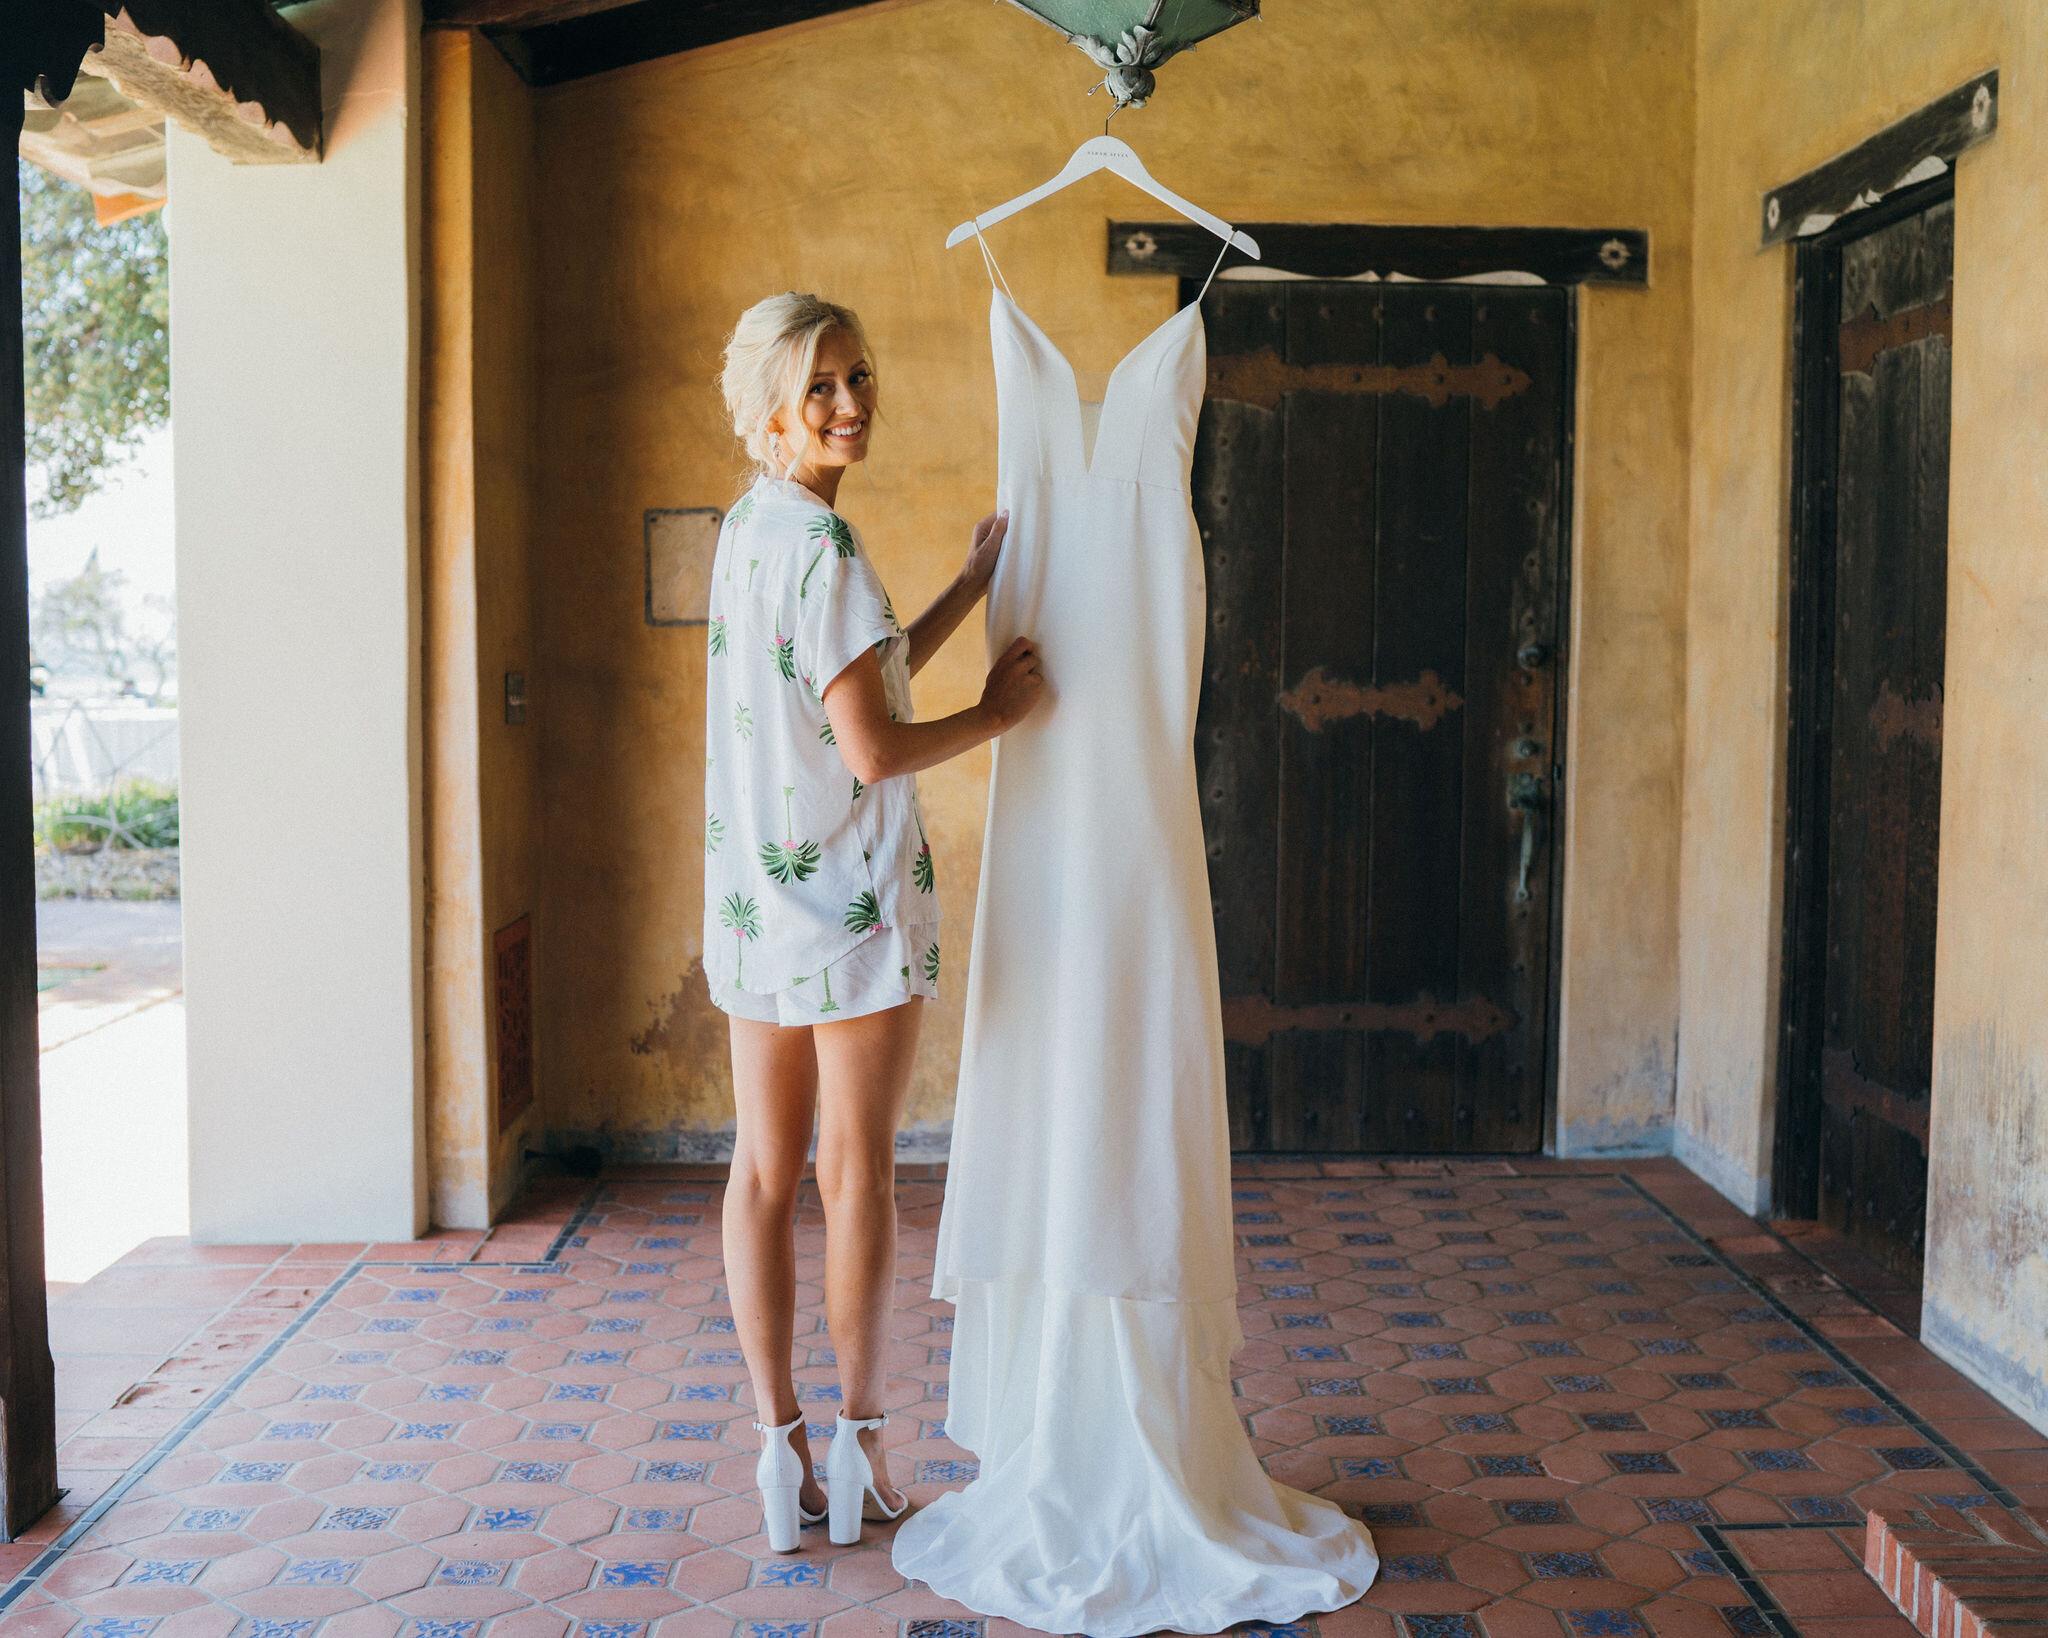 adamson-house-wedding-photography-022.jpg